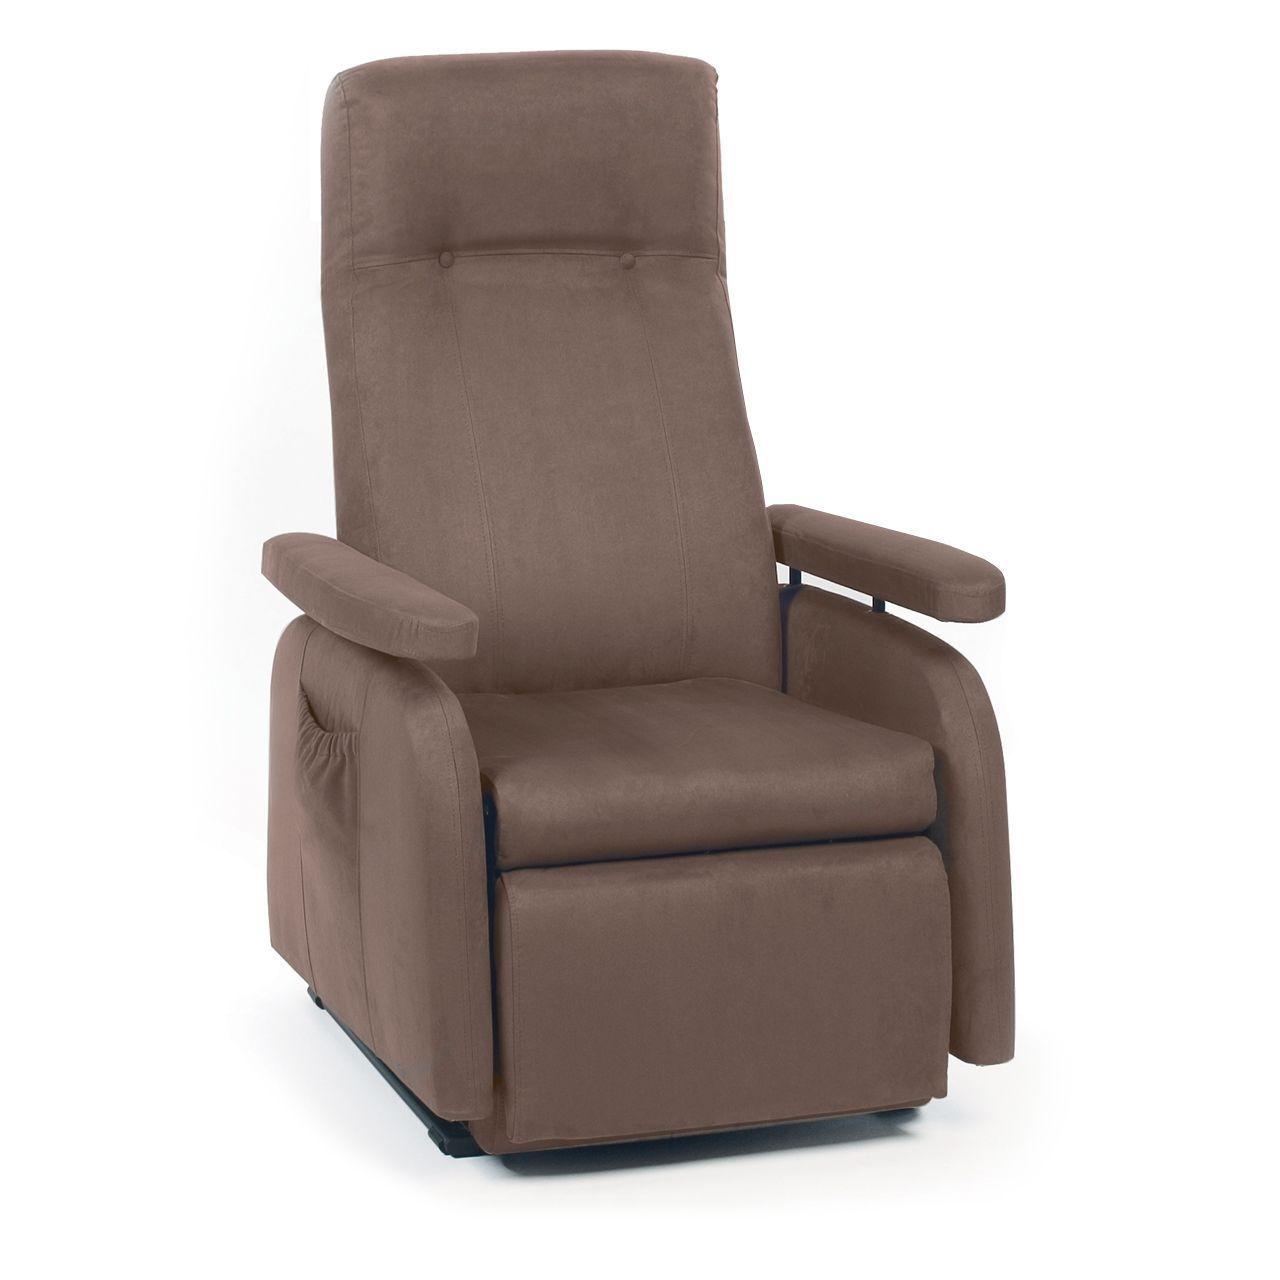 modulair sta-op stoel ARTNRNNB Bruin